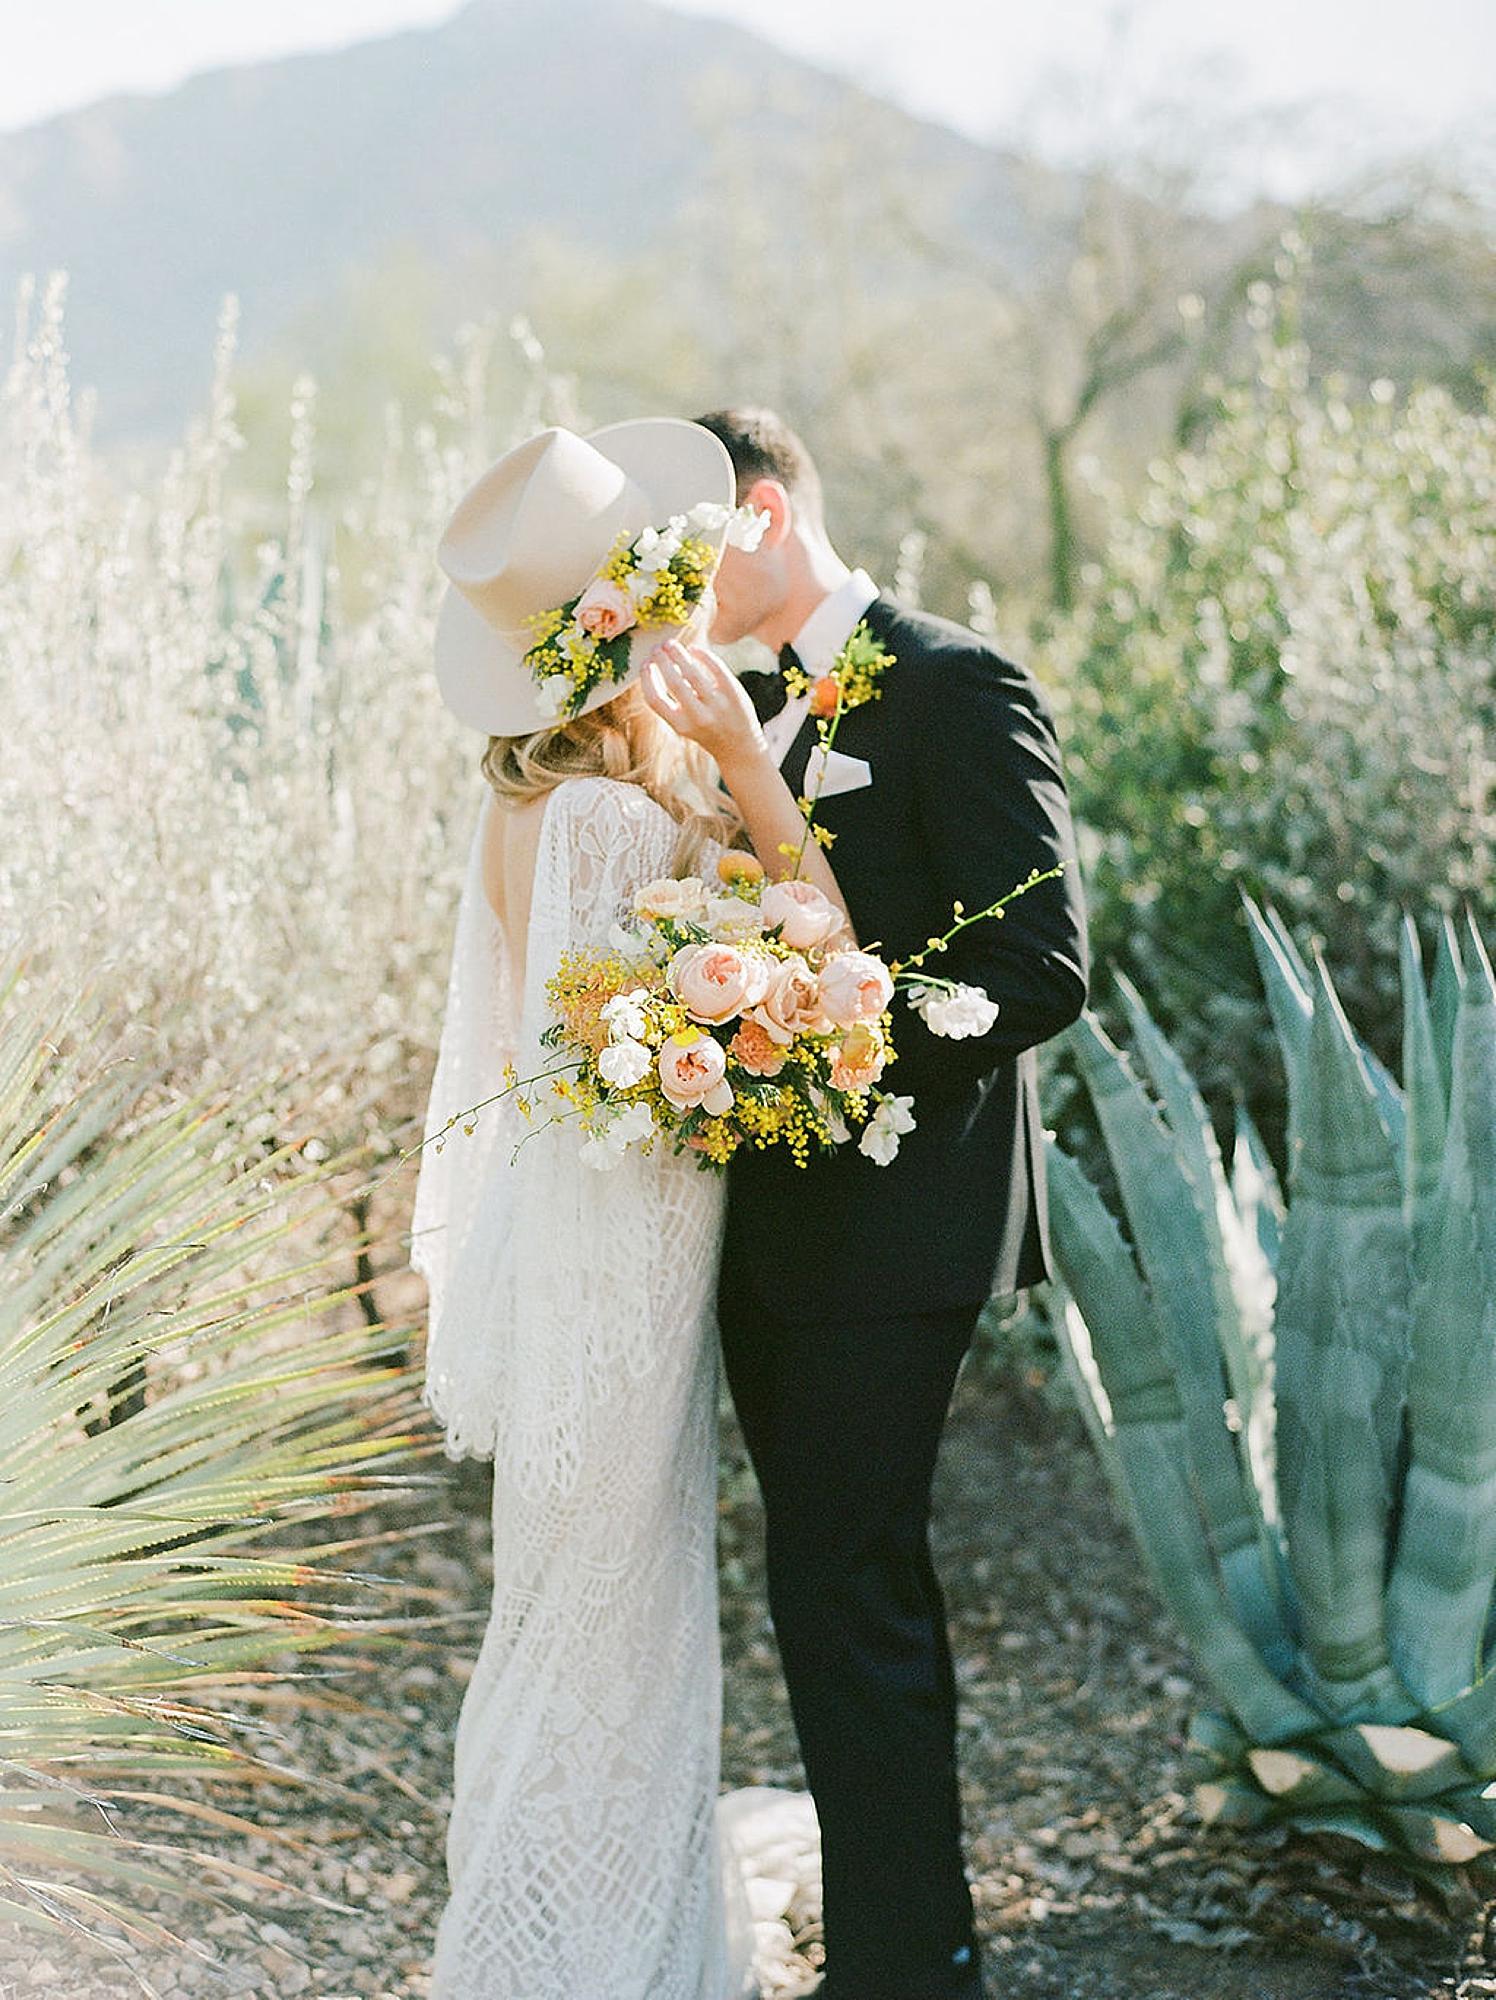 El Chorro Sedona AZ Wedding Photography by Magi Fisher of Magdalena Studios 0041